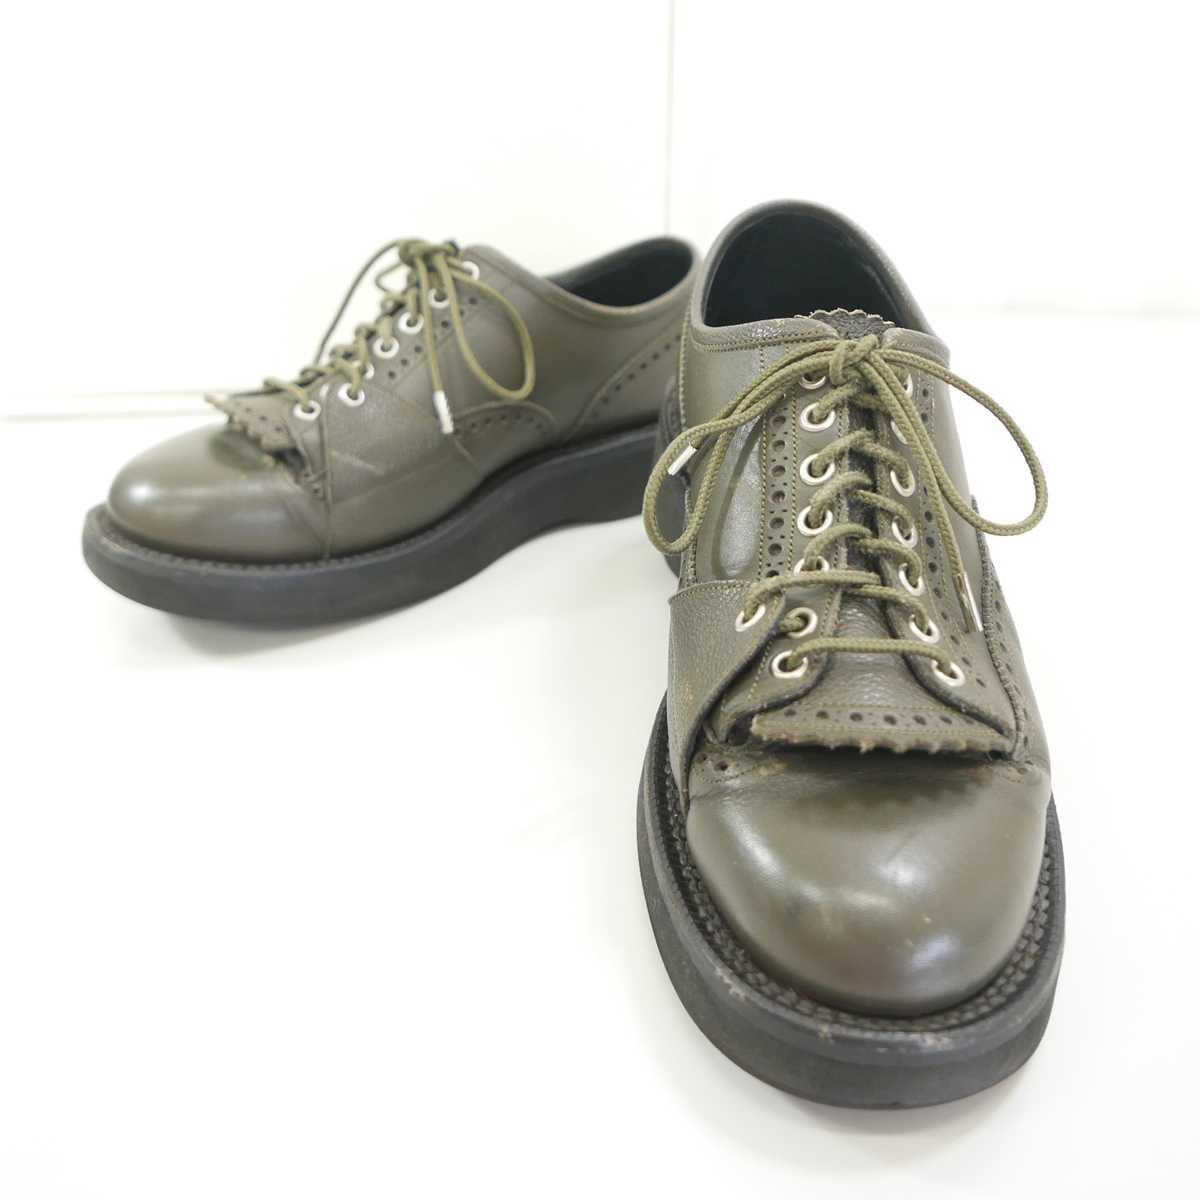 17SS foot the coacher フットザコーチャー COMMANDO SHOES(IMPERIAL SOLE) ラバーソール レザー ブローグ シューズ KHAKI US7.5 【中古】 DN-12794